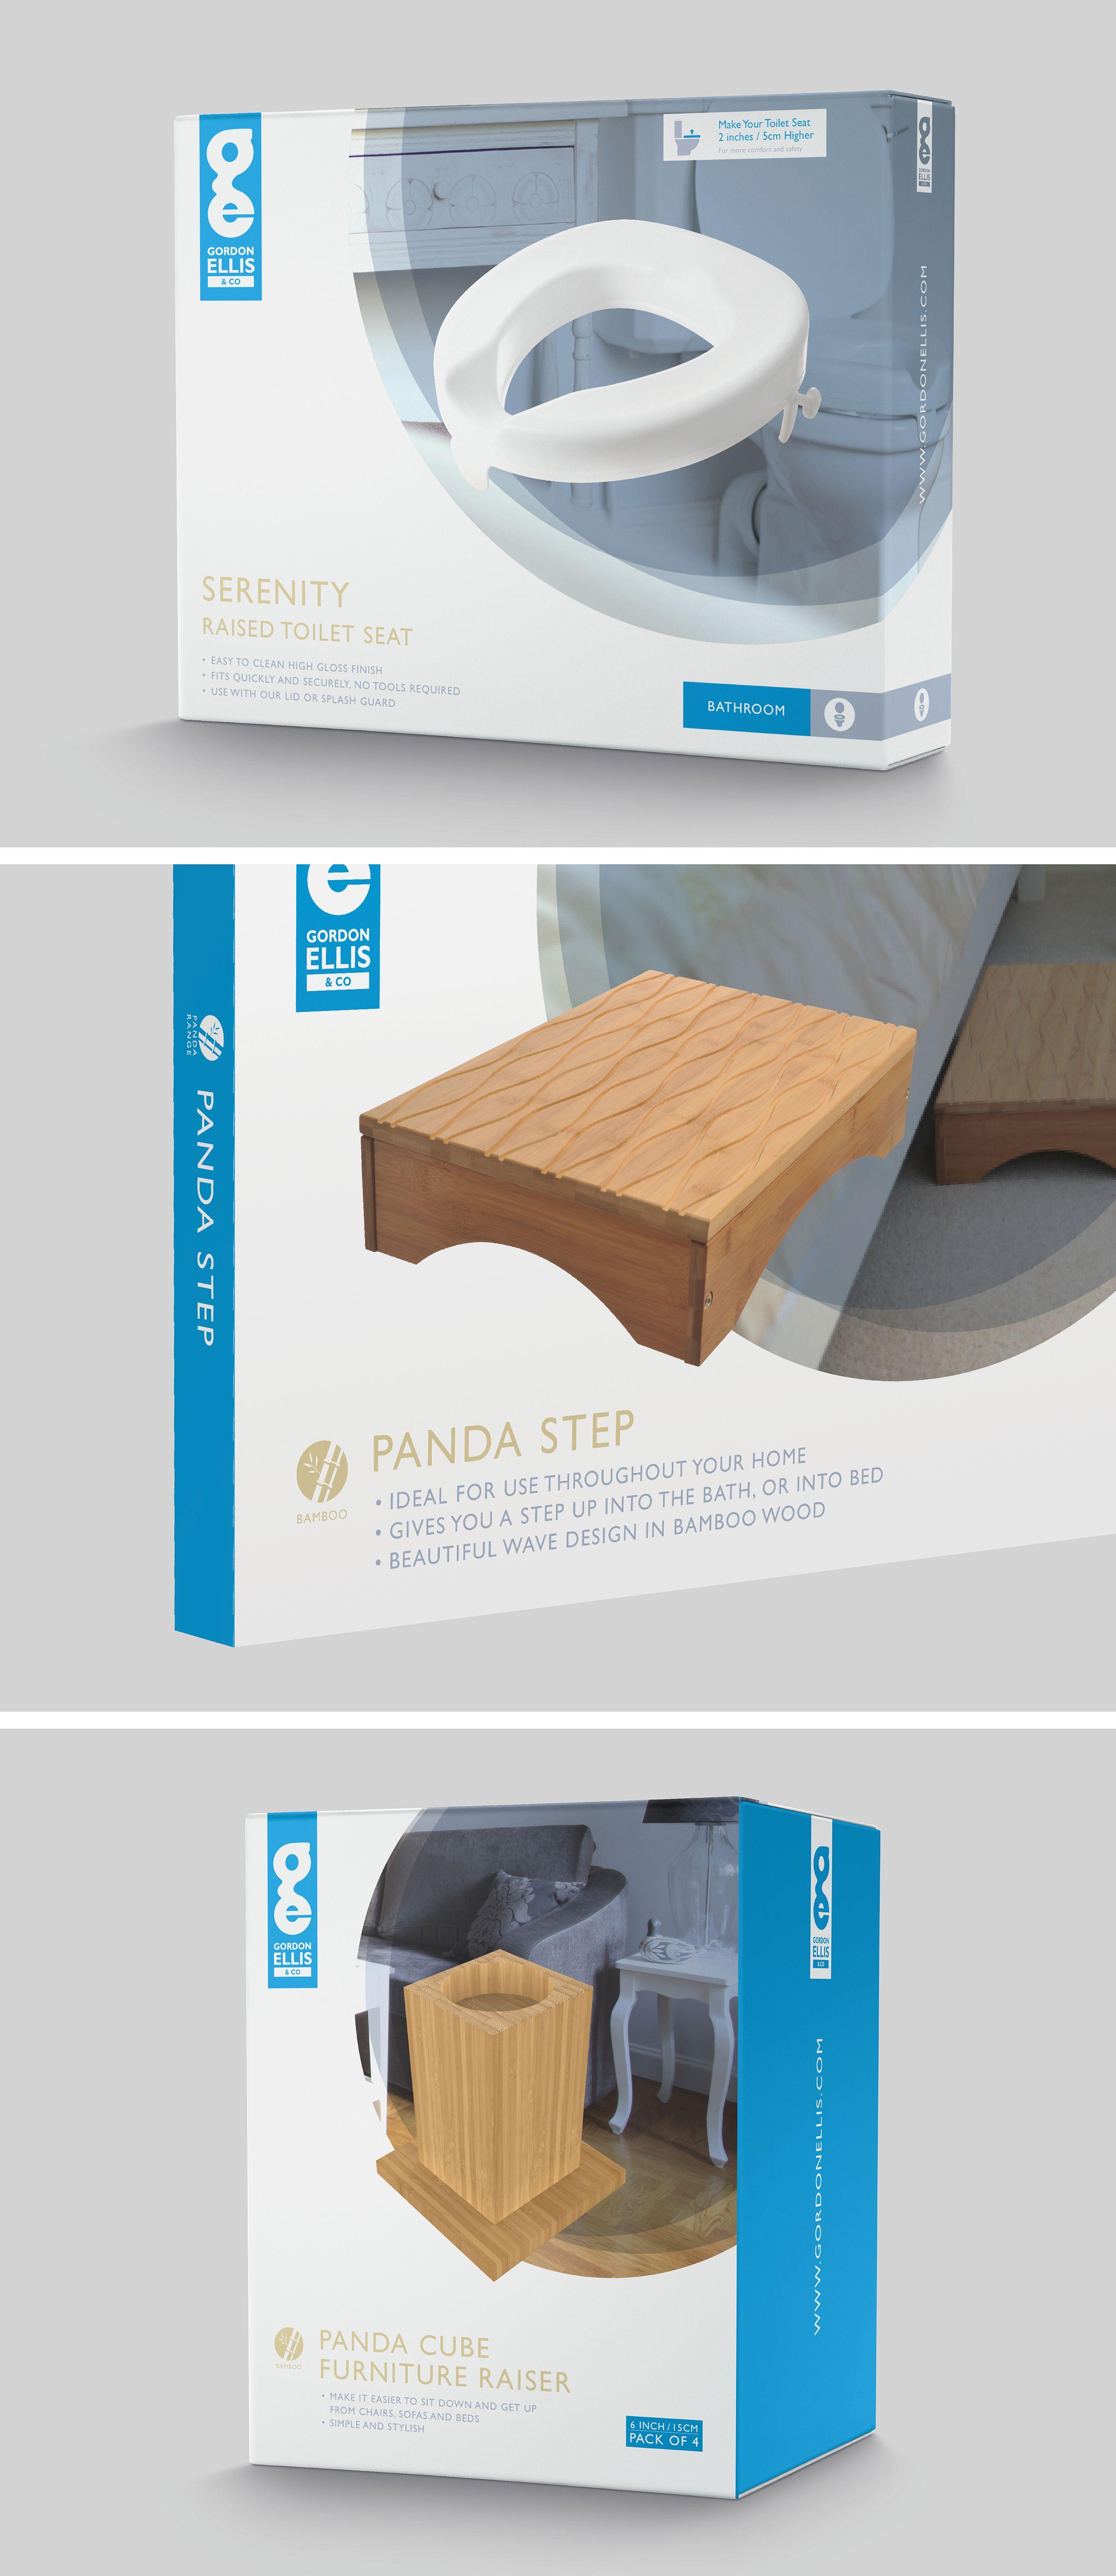 Gordon Ellis - Packaging design including product photoshoot - Aids ...